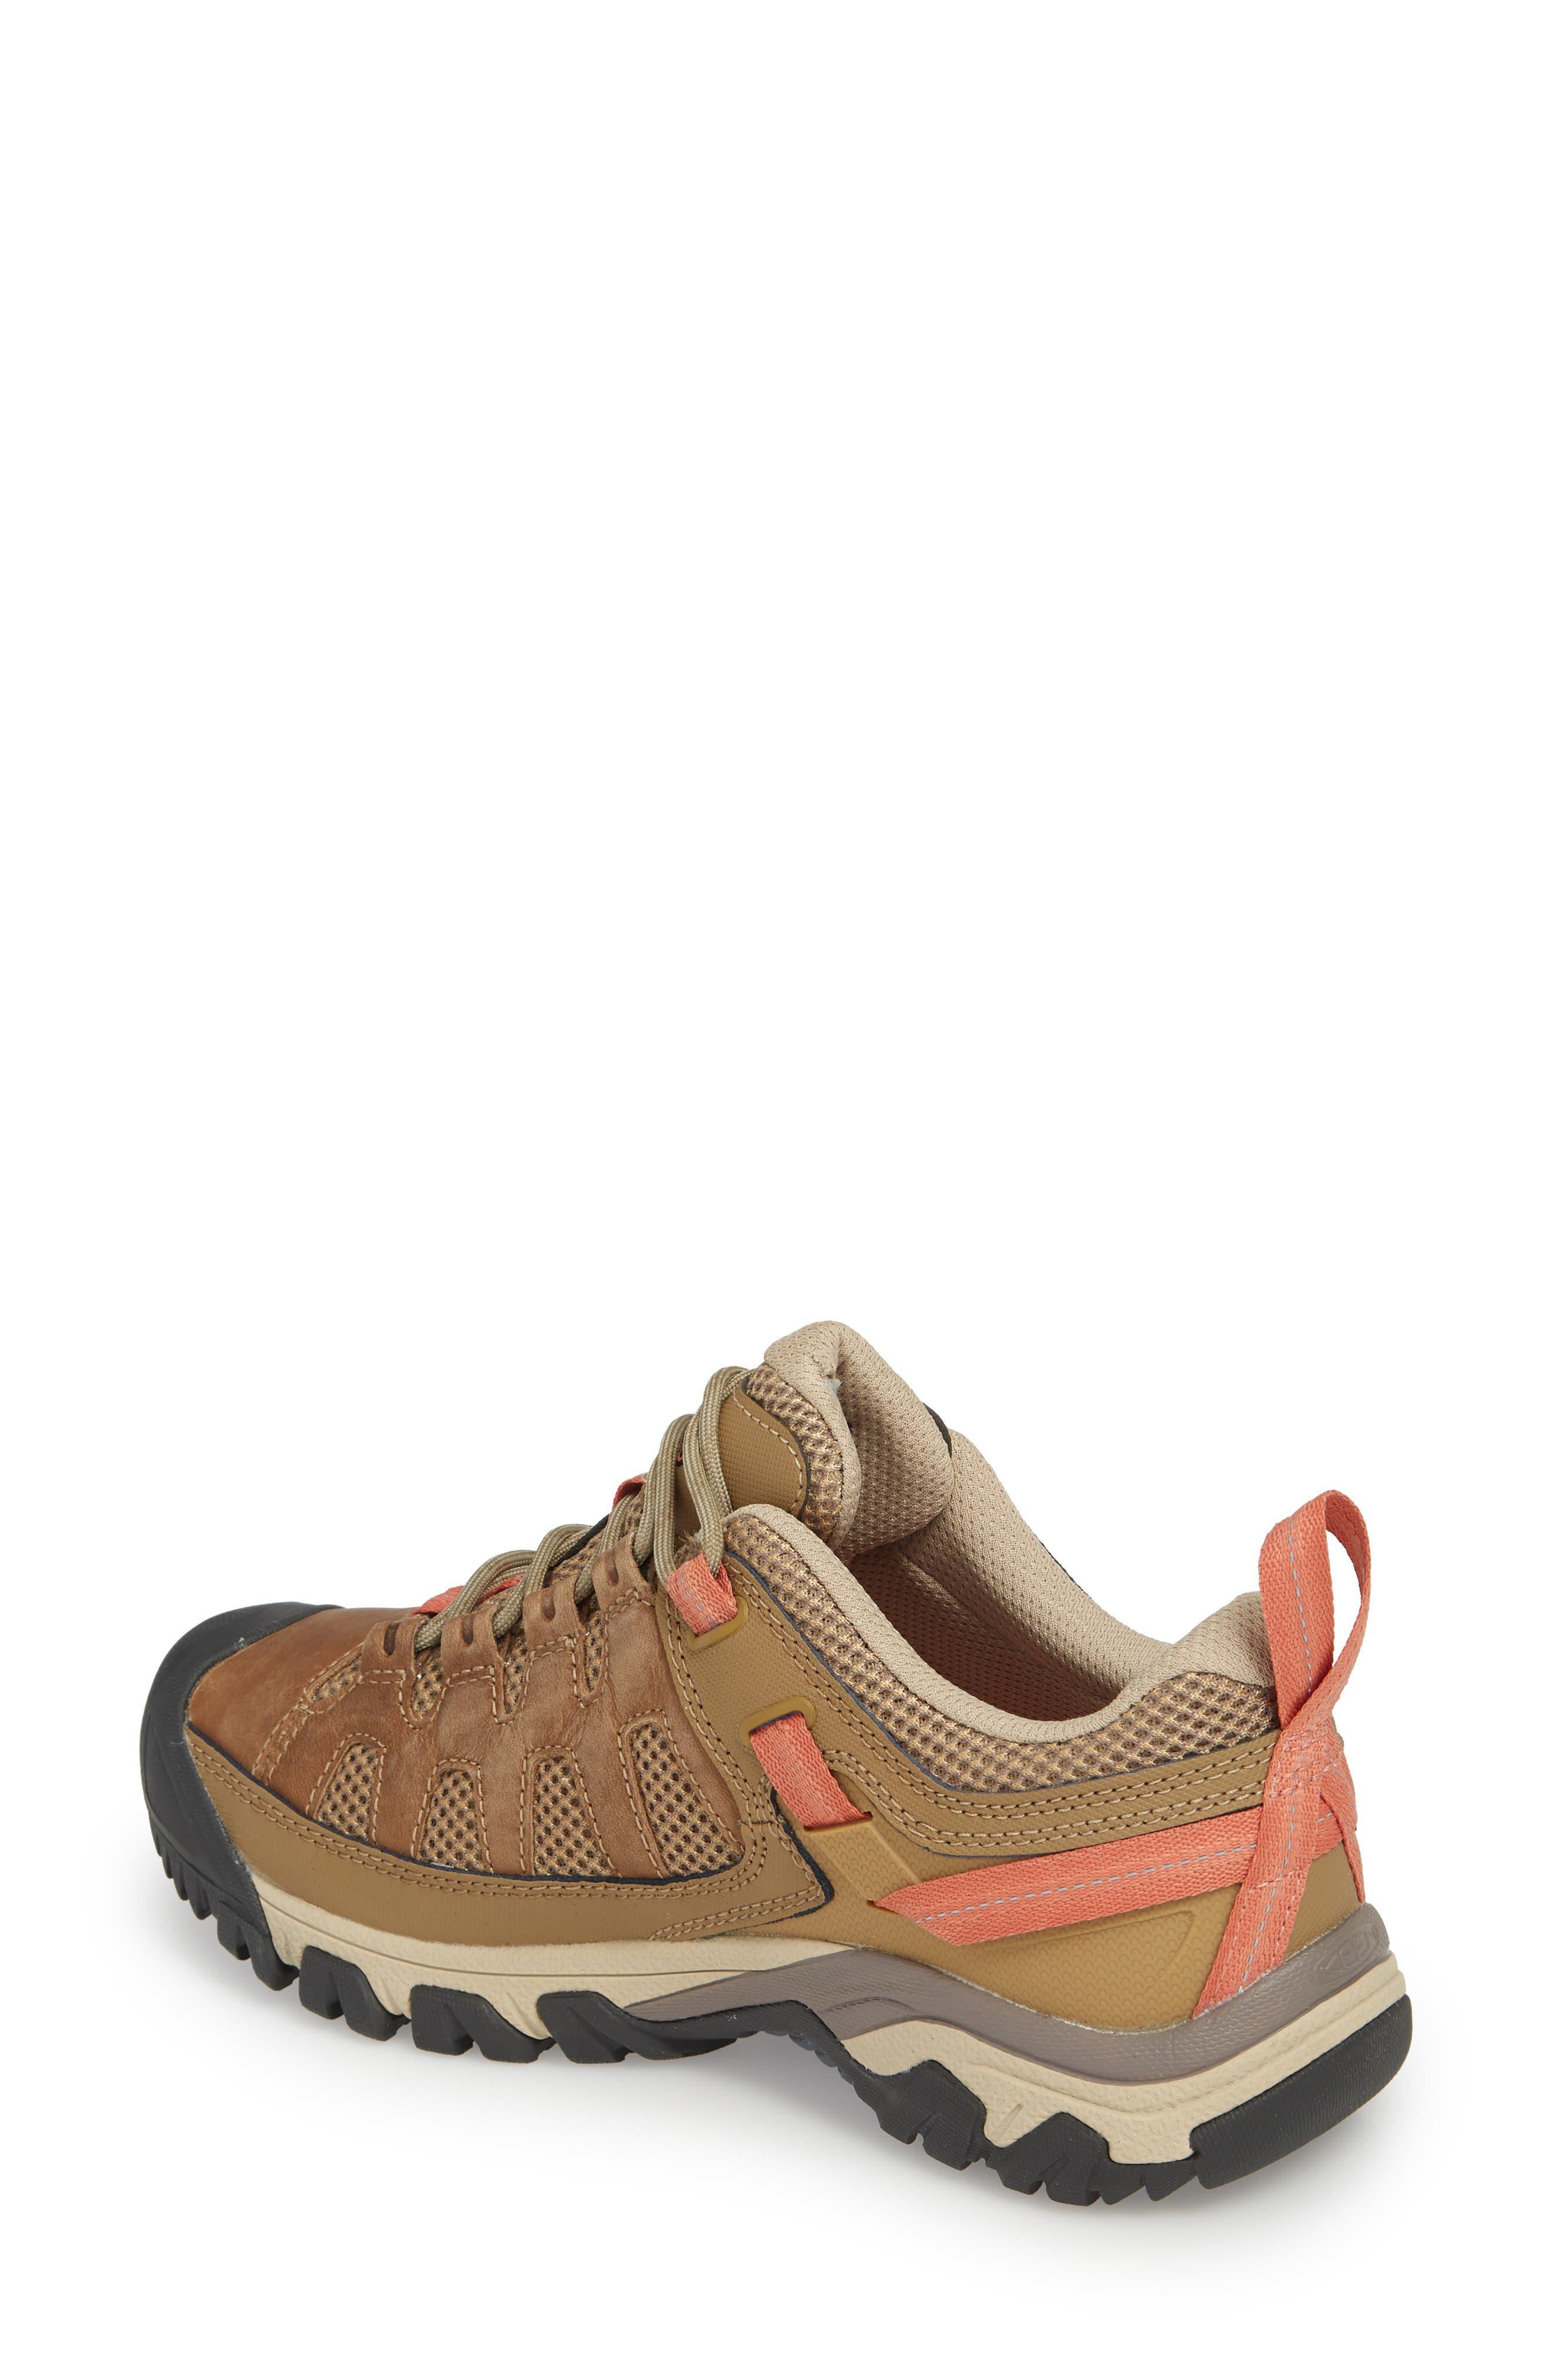 Targhee Vent Hiking Shoe,                             Alternate thumbnail 2, color,                             Sandy/ Cornstalk Leather